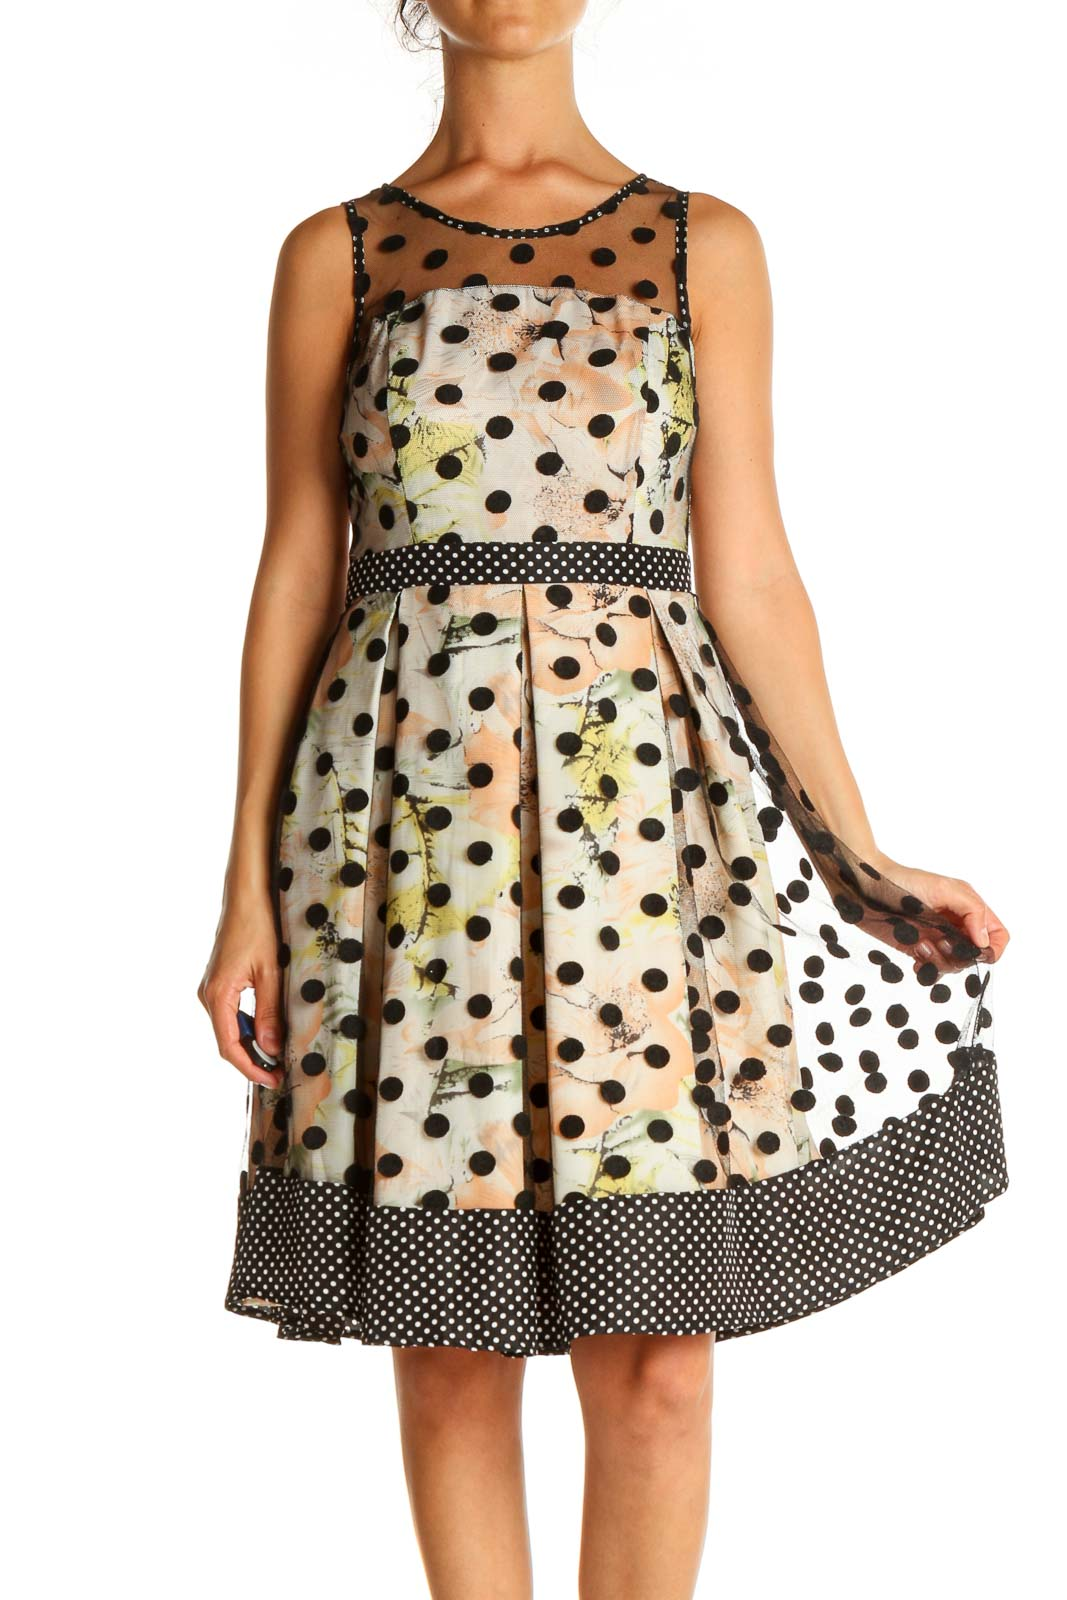 Beige Polka Dot Day Fit & Flare Dress Front